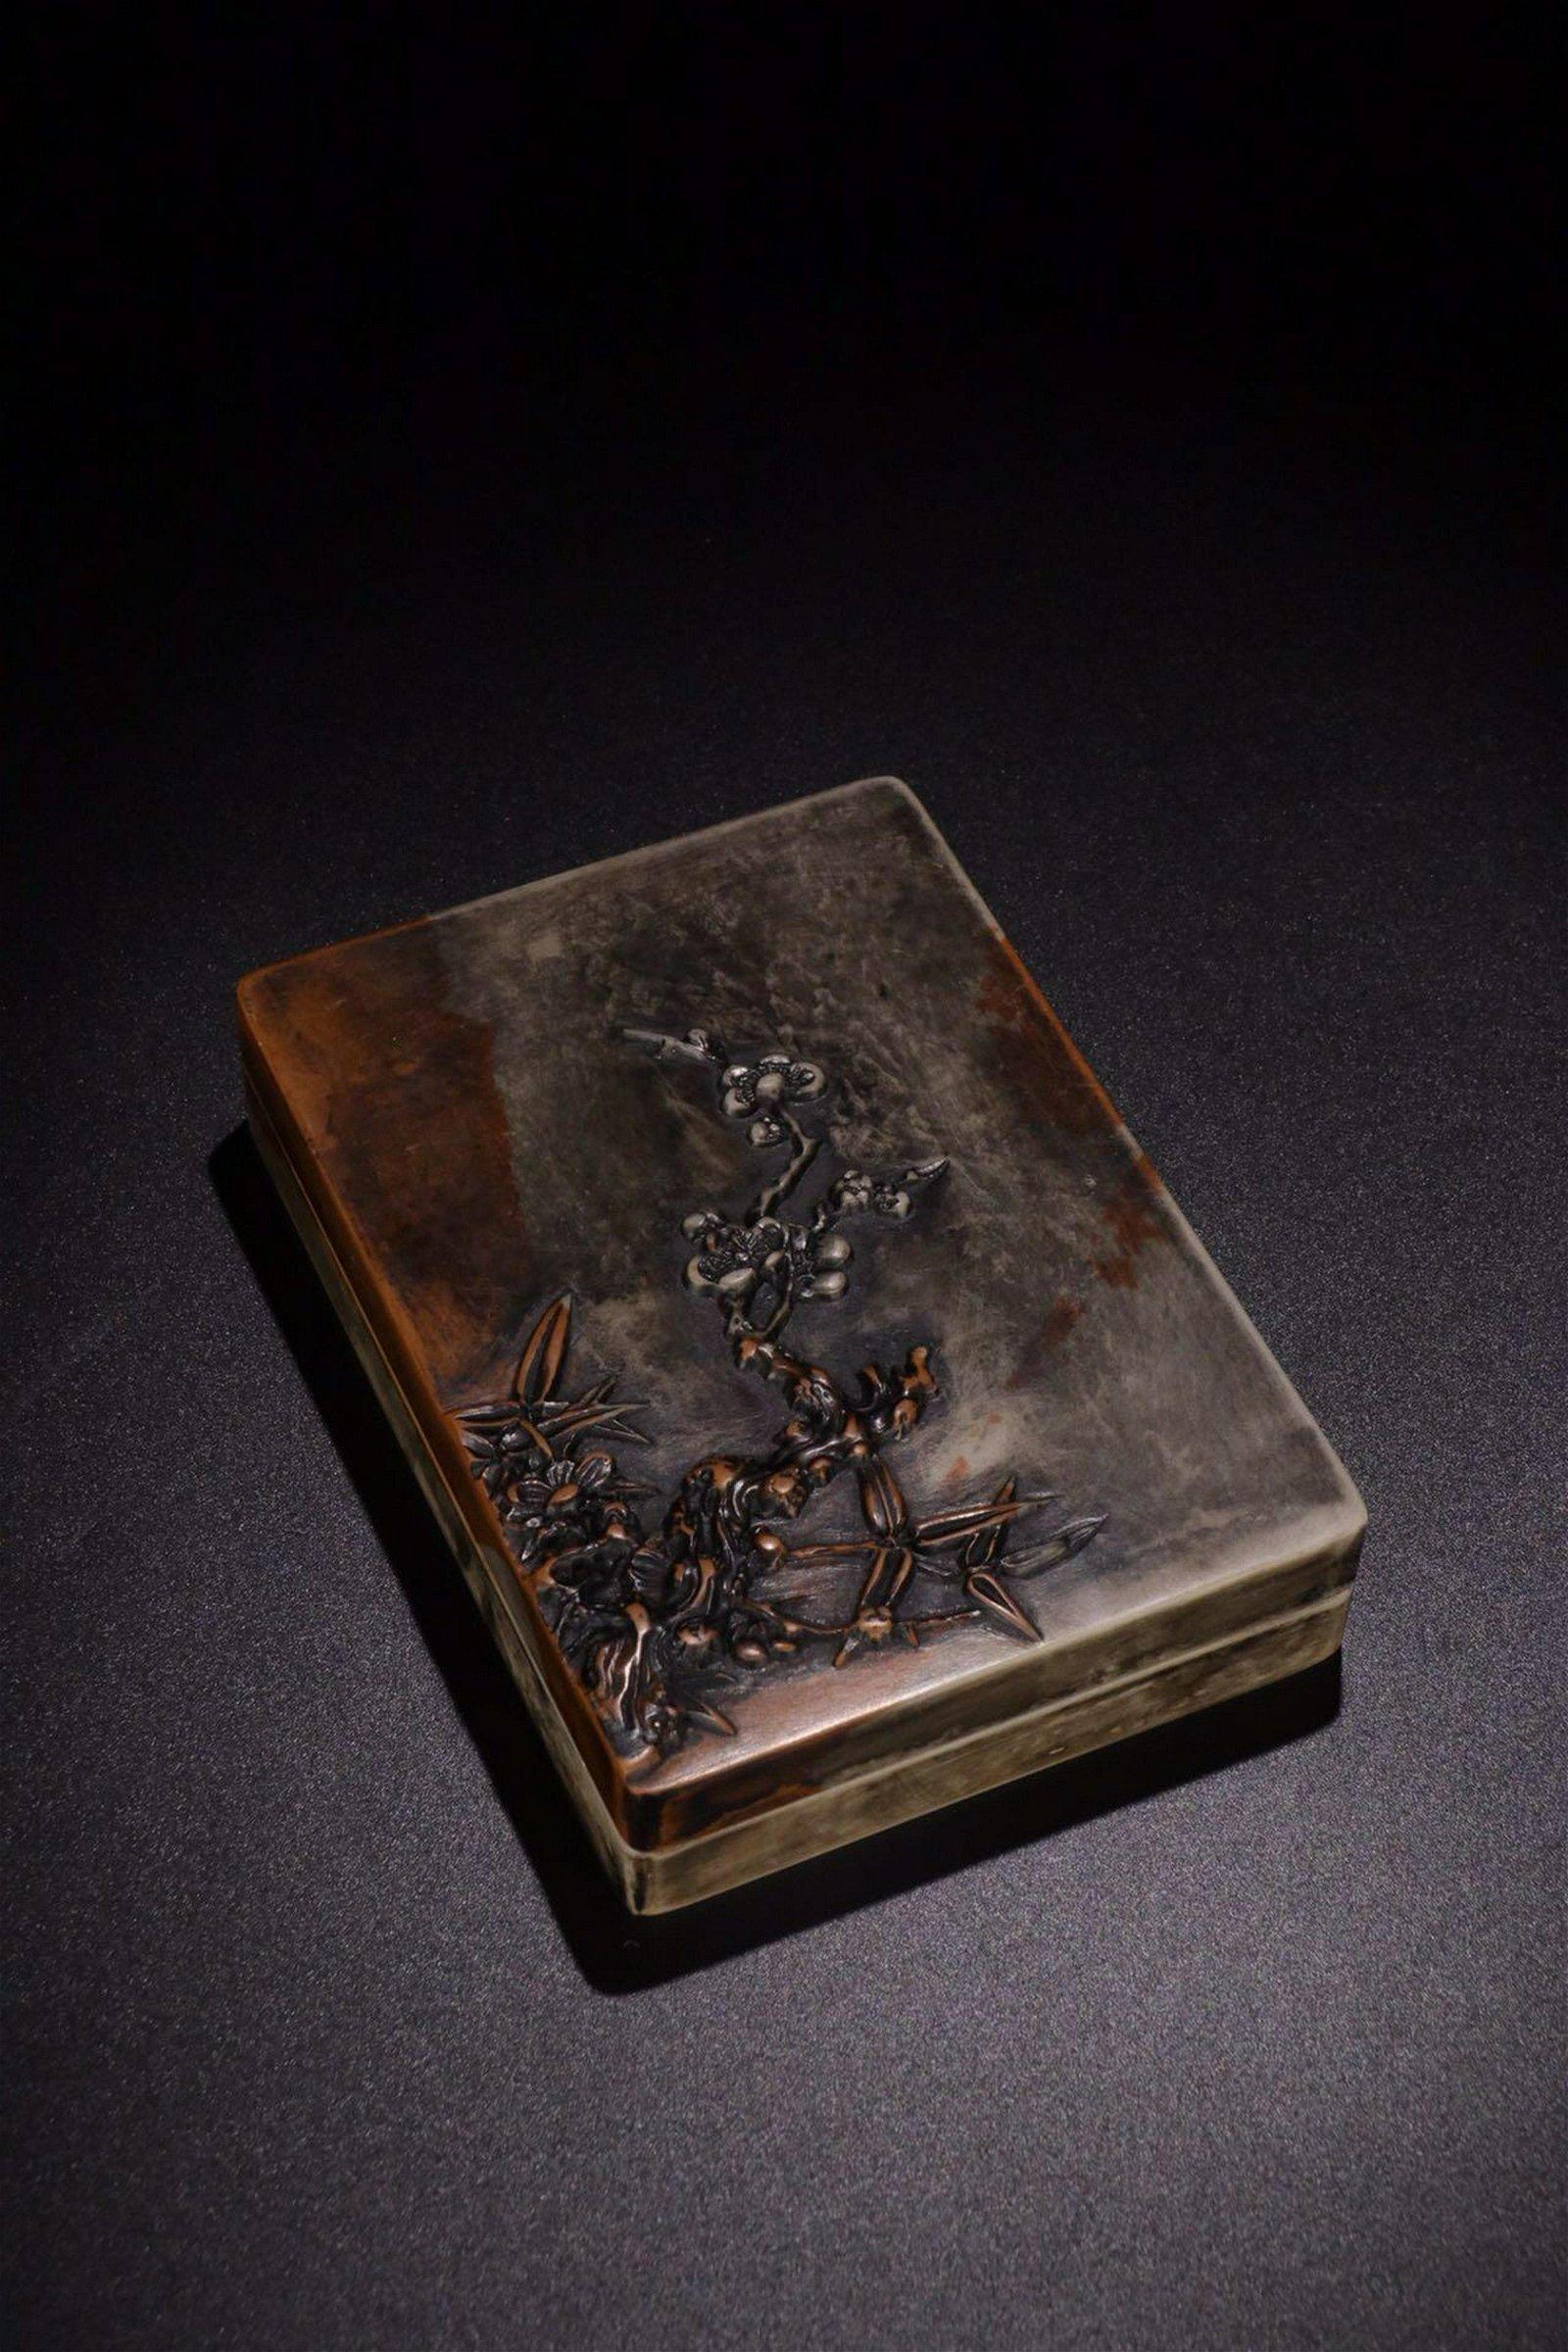 A SONGHUA STONE PLUM FLOWER PATTERN INK SLAB